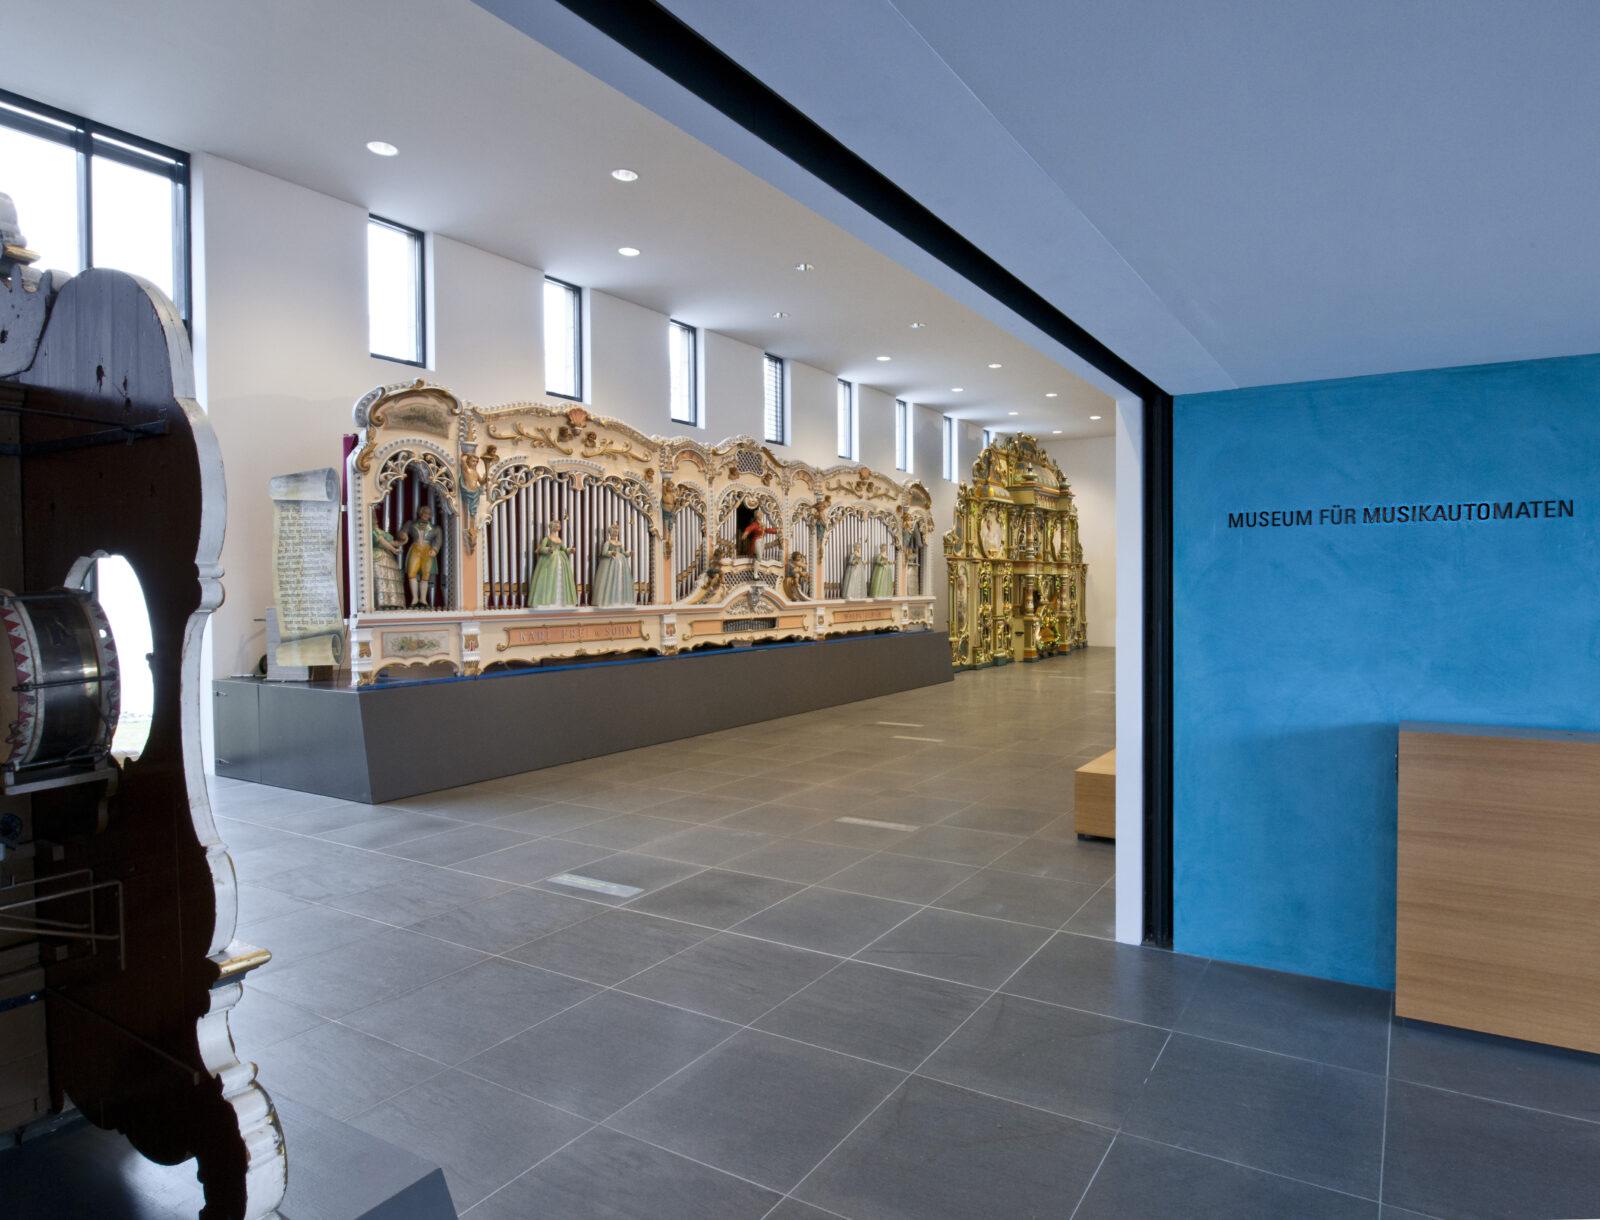 04 MMA 03 Eingang Foyer grosse Orgeln Foto St Tremp